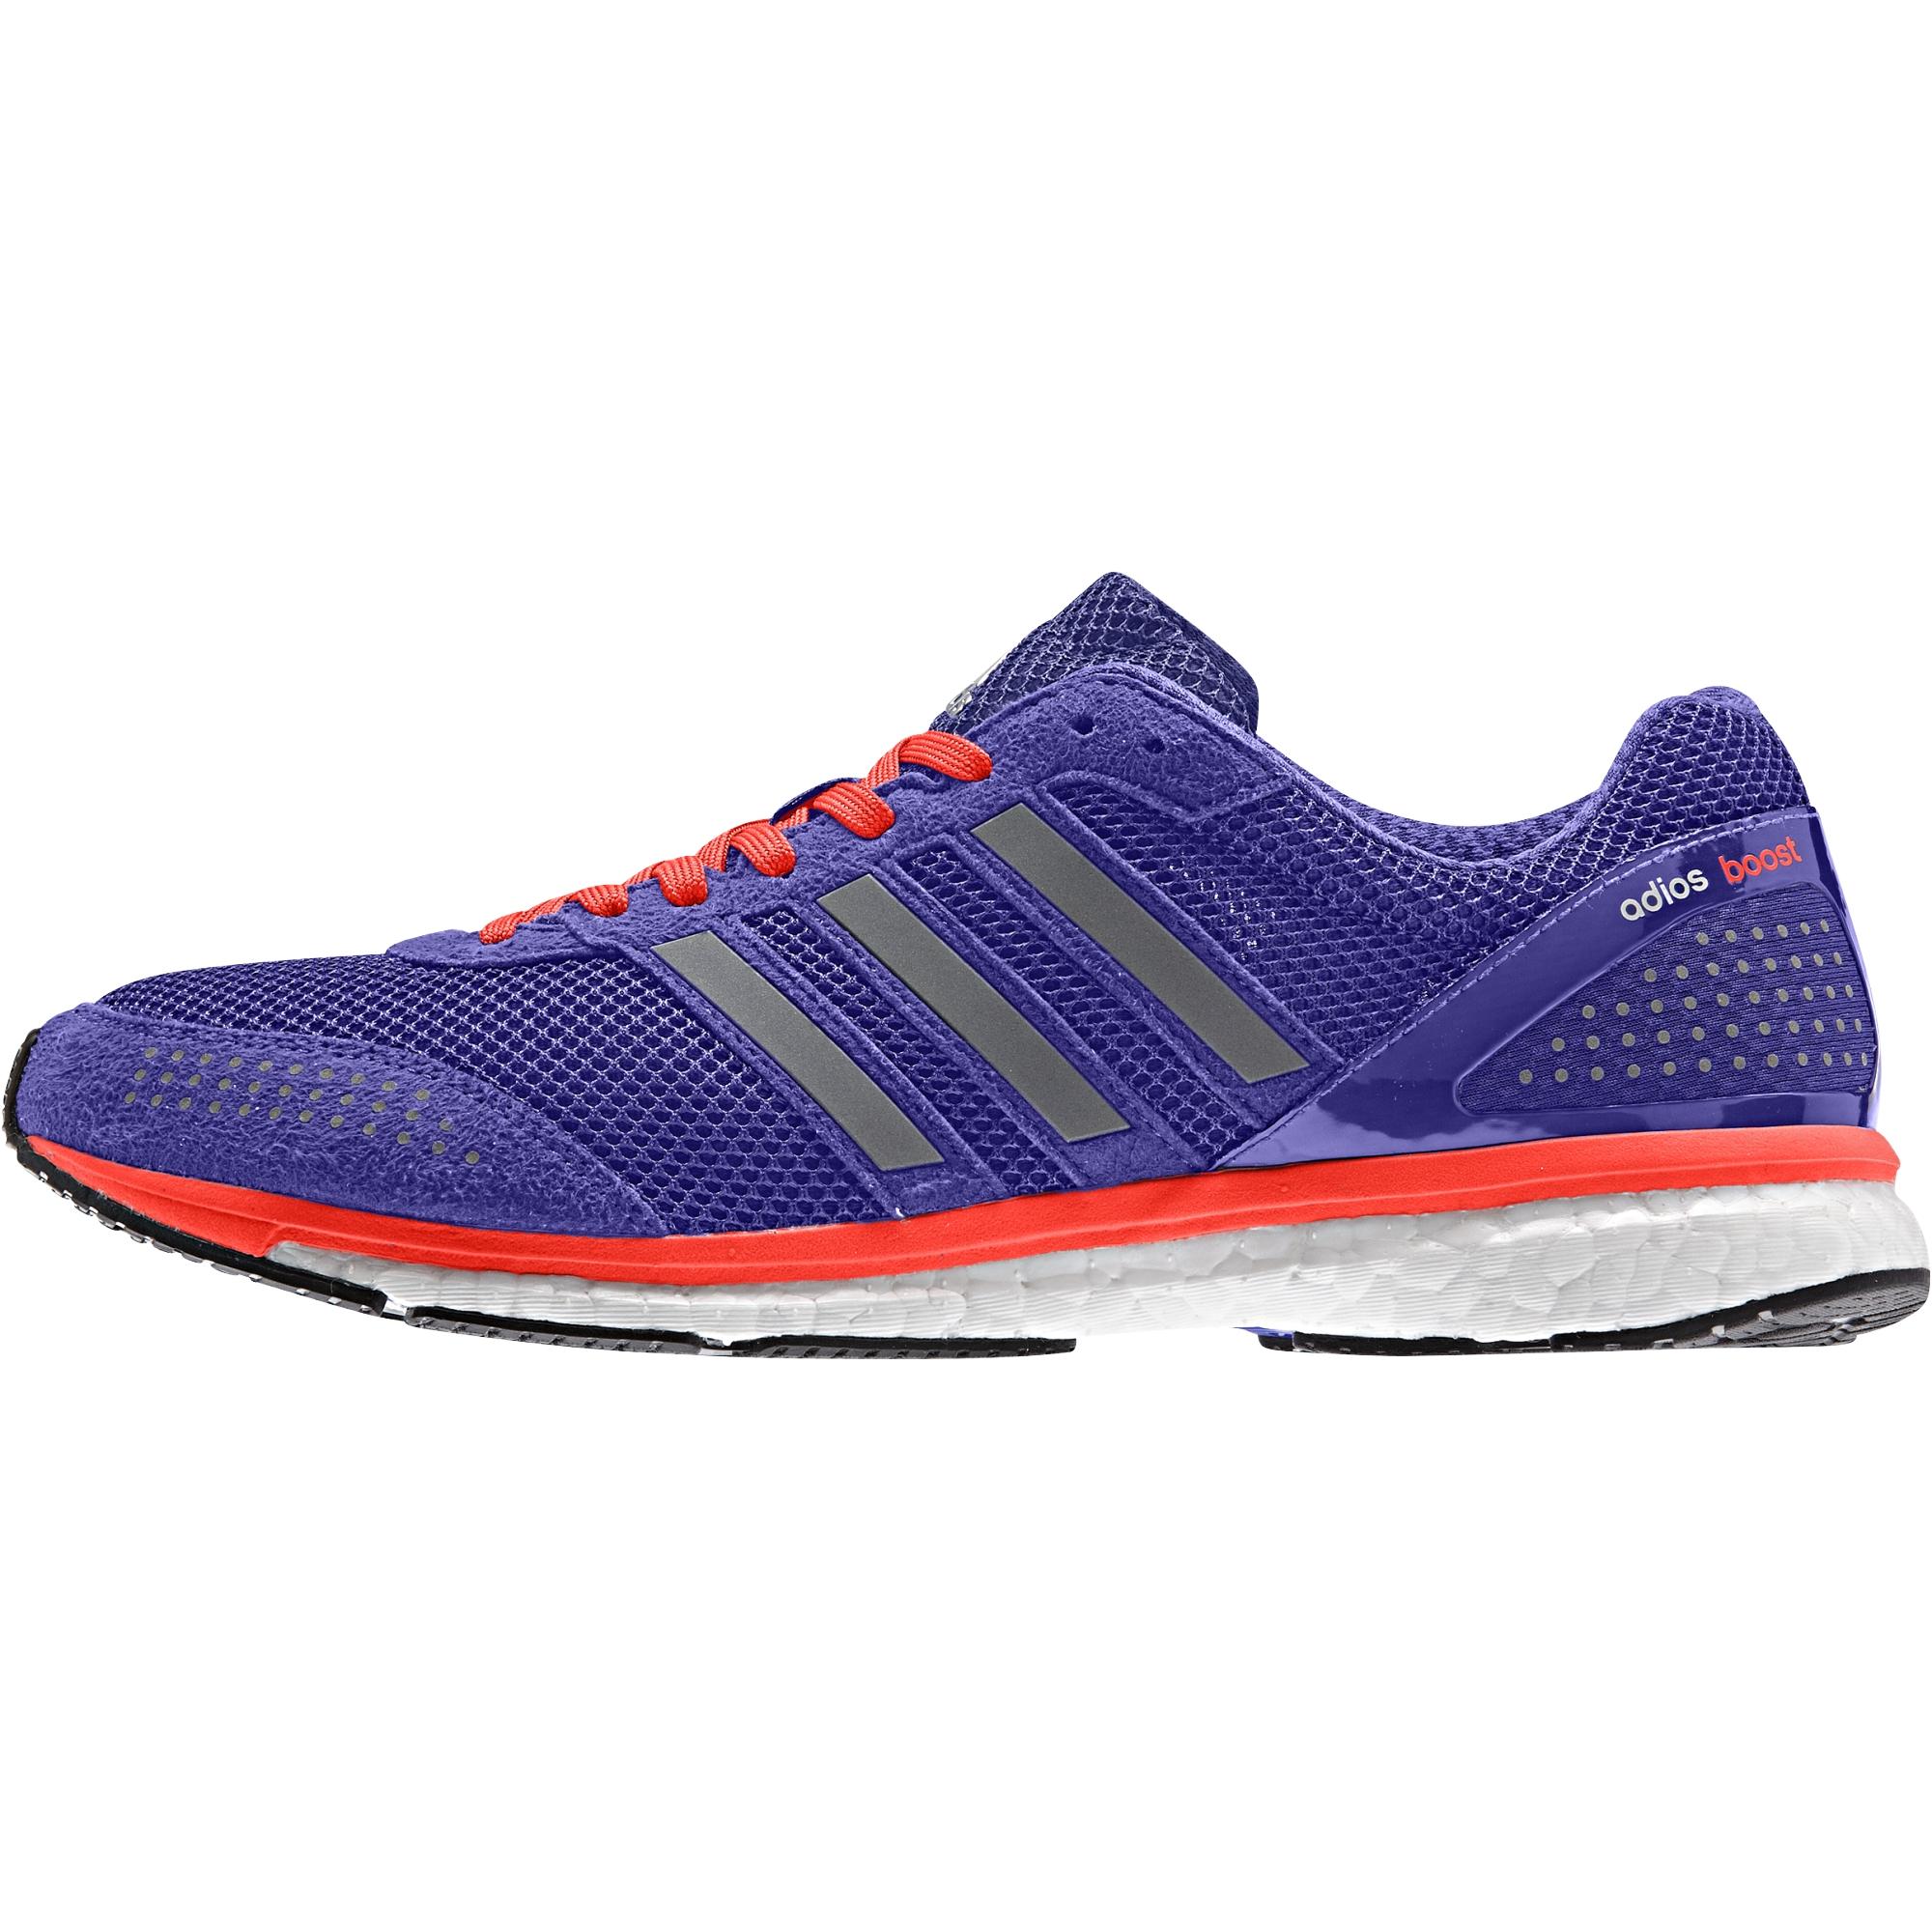 Adidas Adizero Adios 1 | Adidas Adizero 3.0 | Adidas Adios